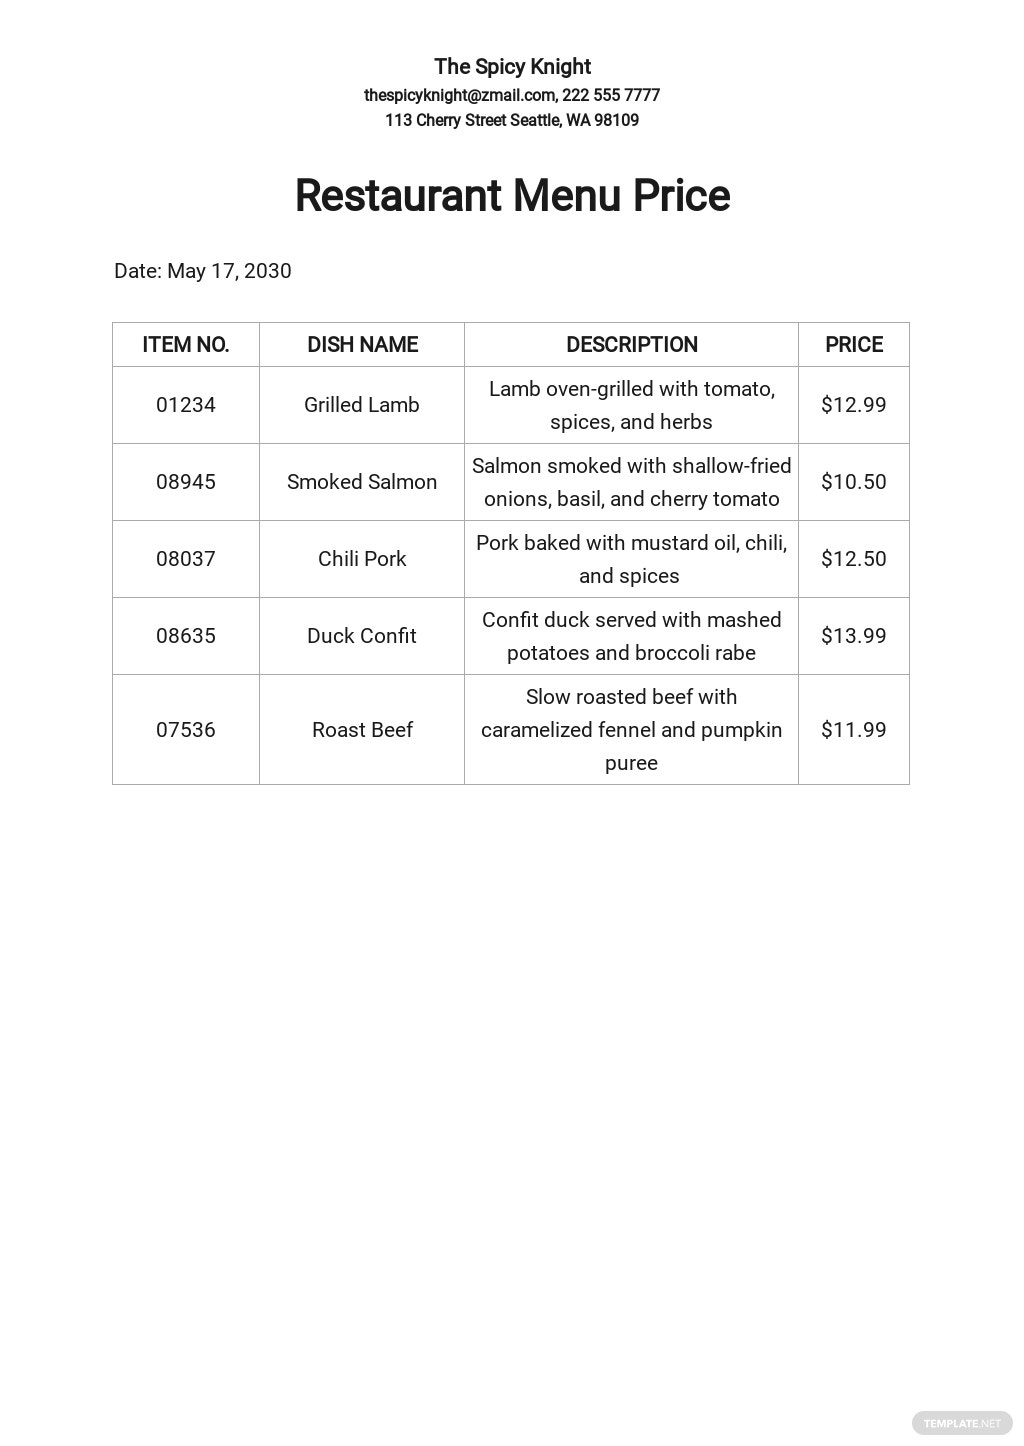 Free Restaurant Menu Price List Template.jpe